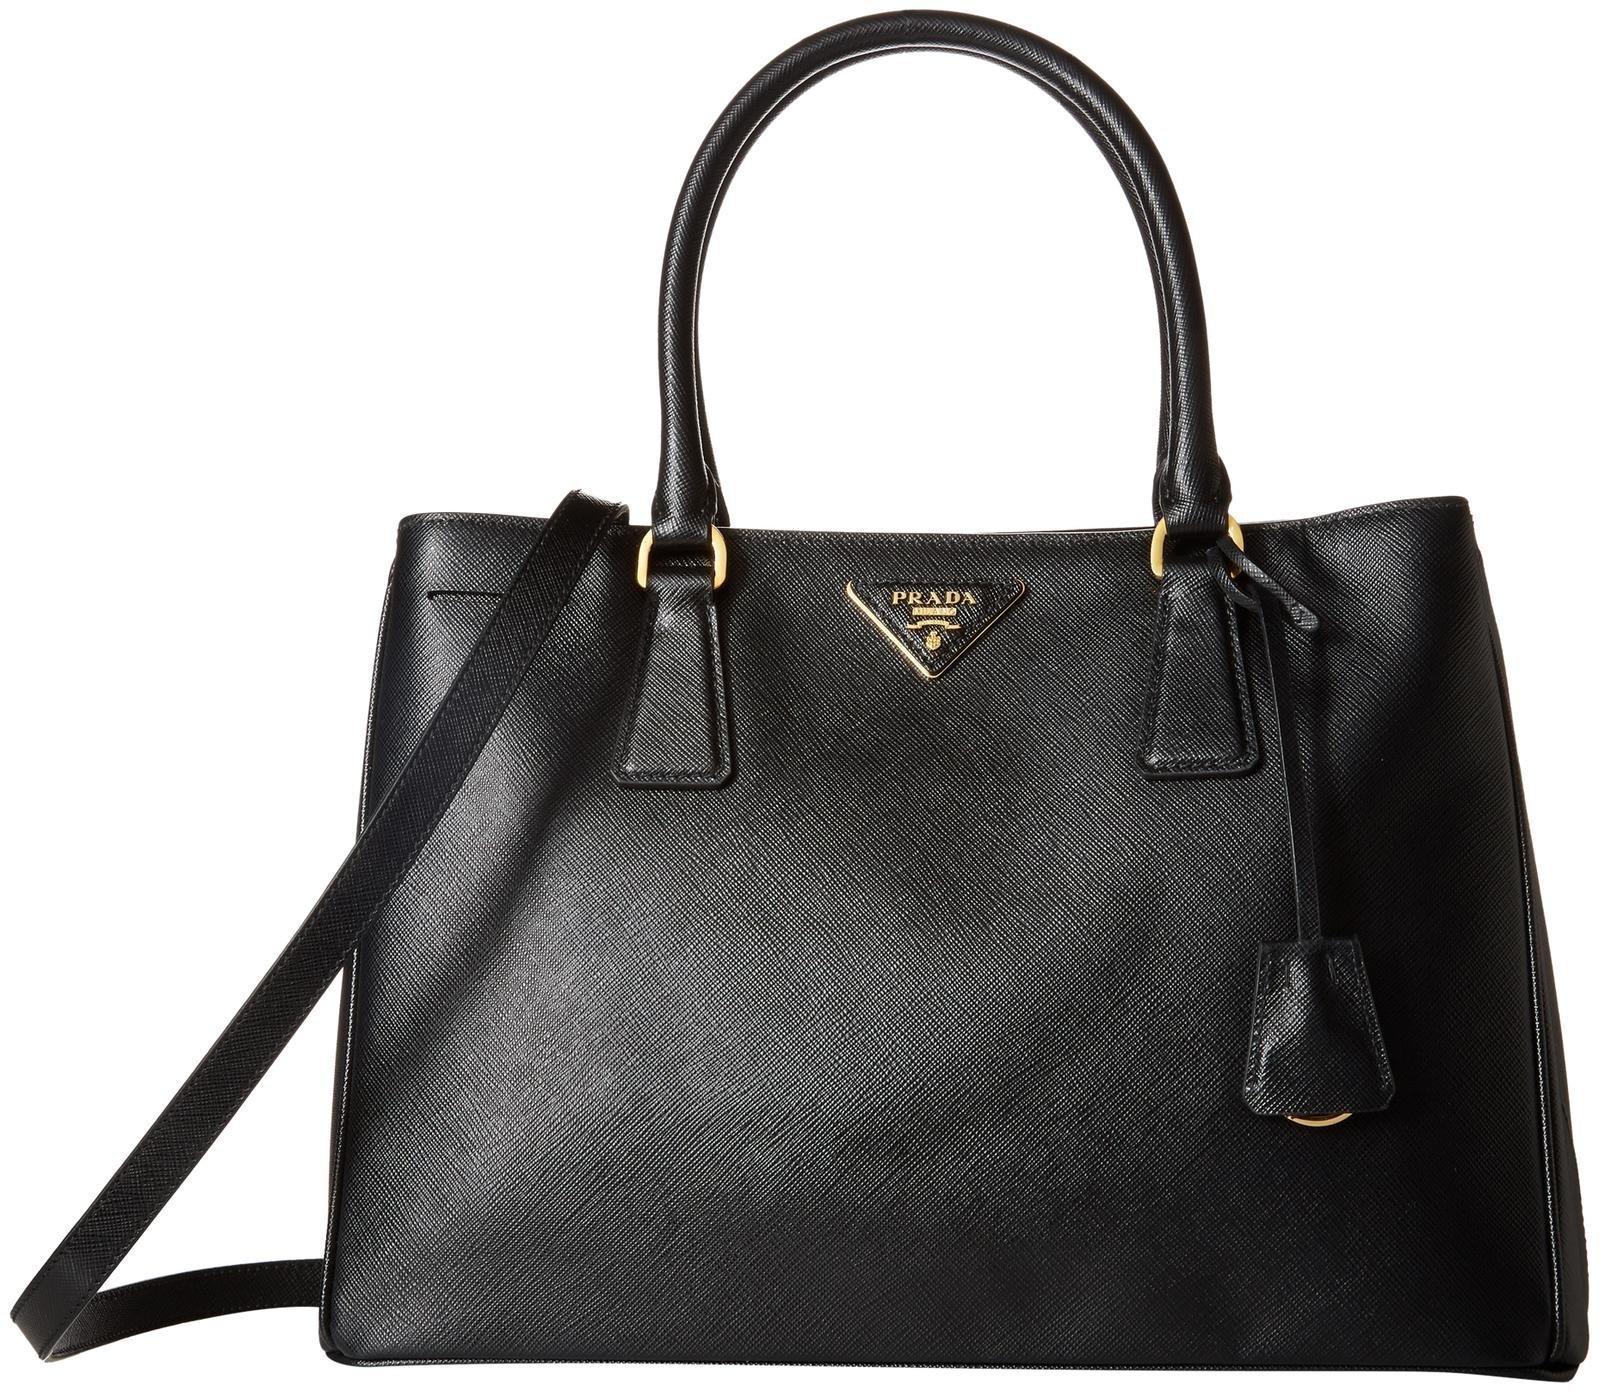 Prada Leather Wallet Bn1874nzvf0002, Black by Prada